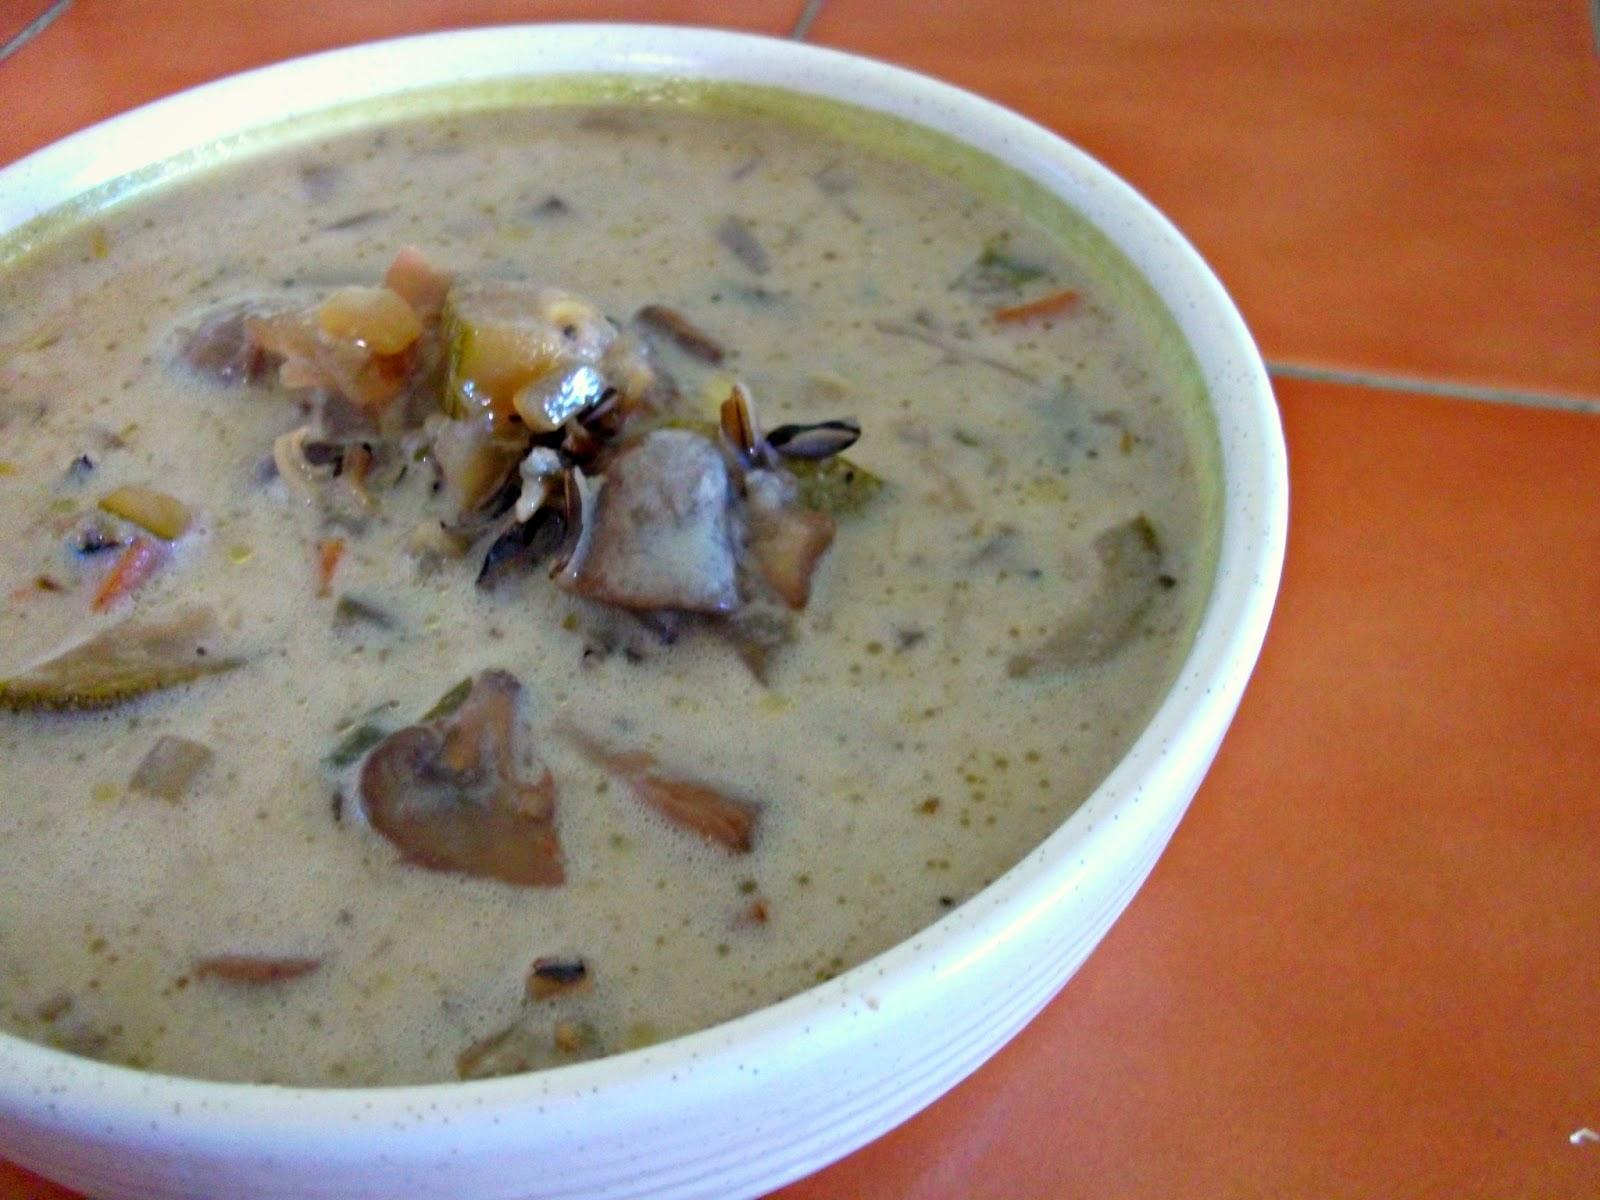 Julia's (Vegan) Kitchen: Creamy Mushroom Wild Rice Soup